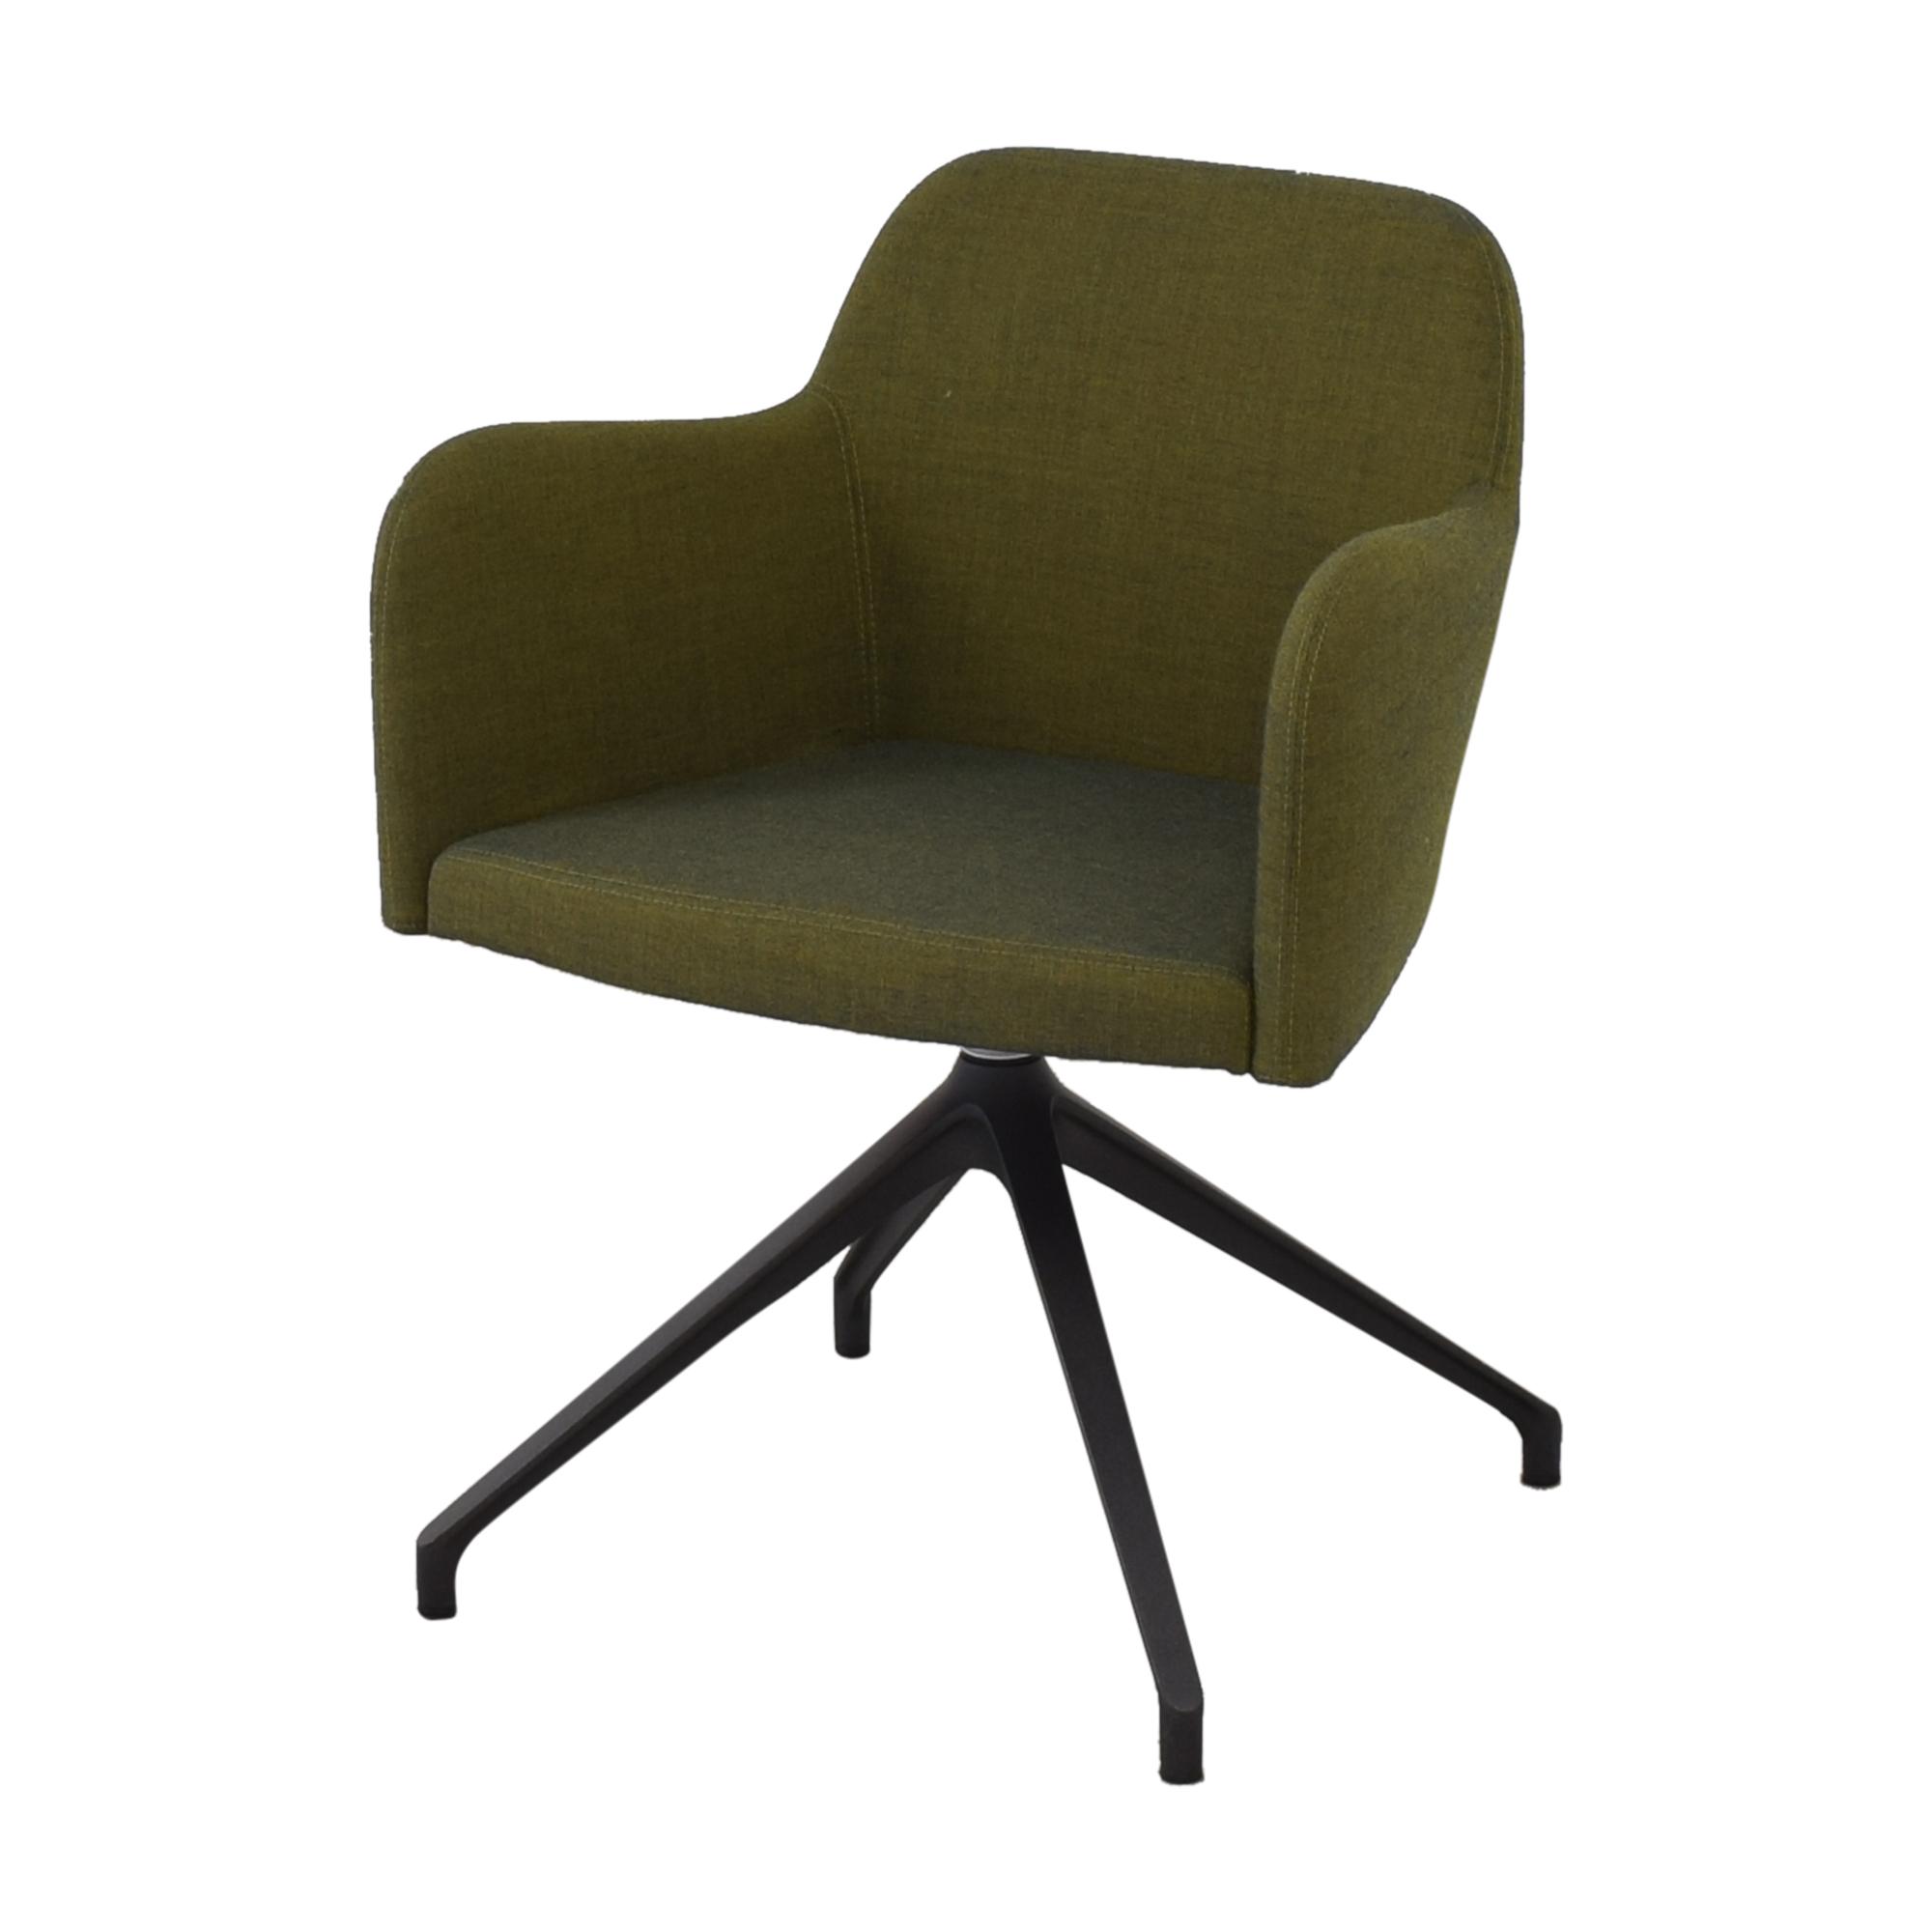 Koleksiyon Koleksiyon Miranda Cantilever Armchair Accent Chairs